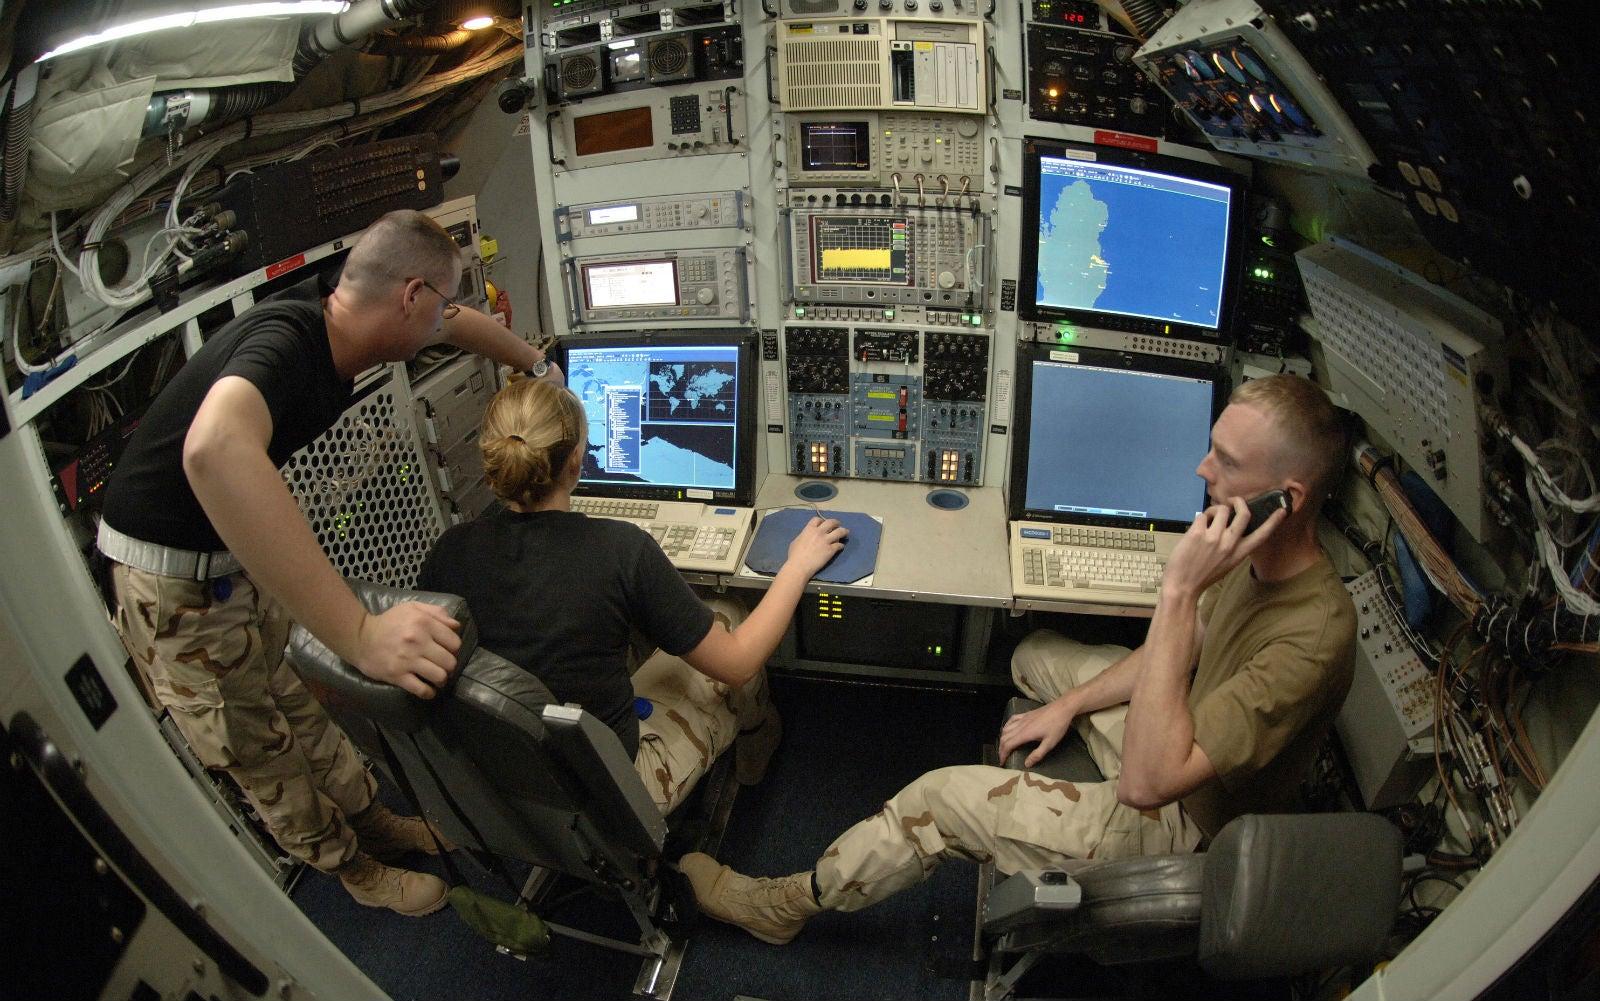 America's Most Important Spy Plane That Isn't an SR-71 Blackbird